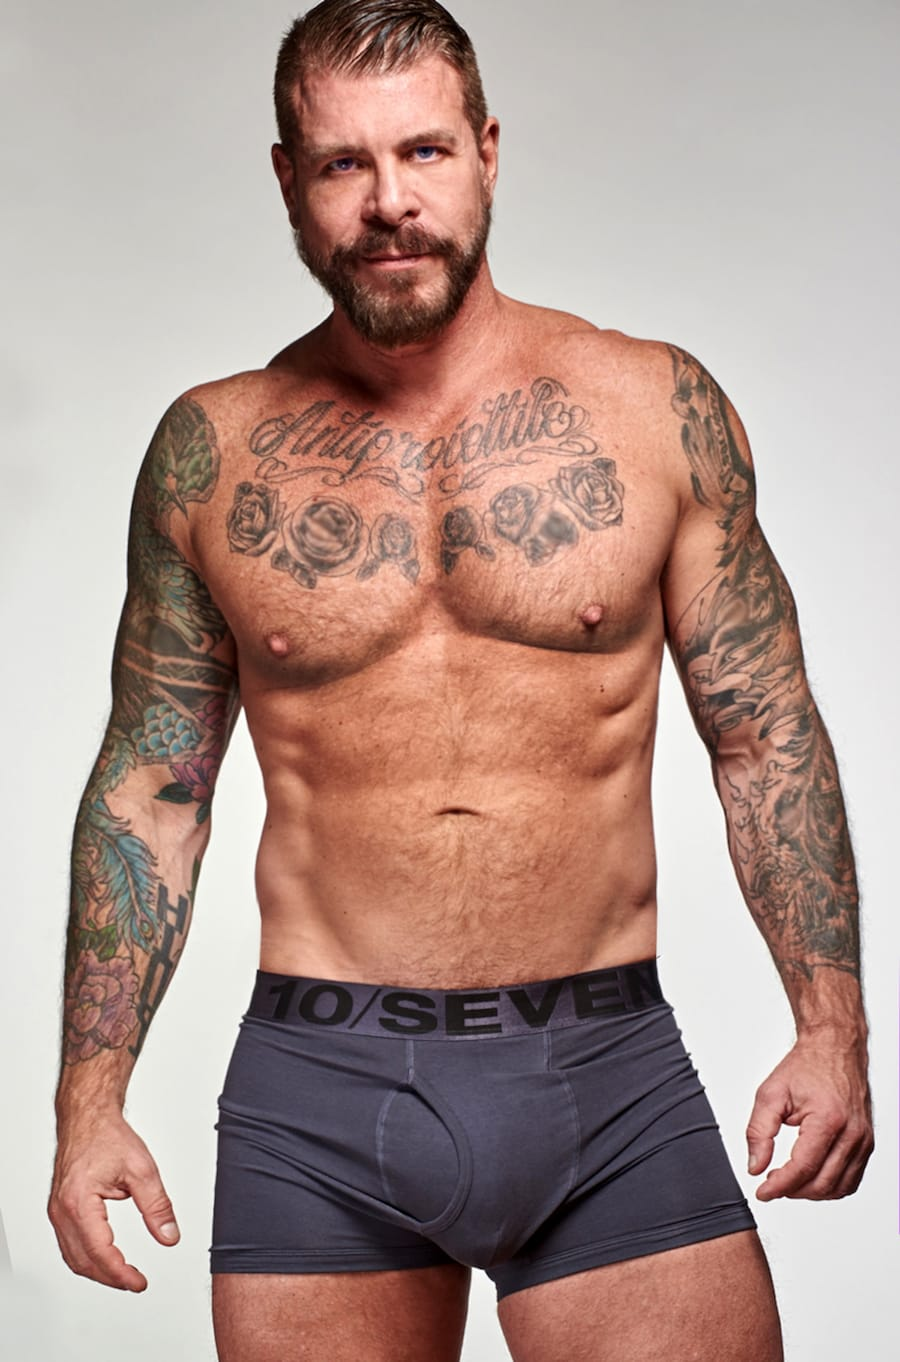 rocco steele gay porn star